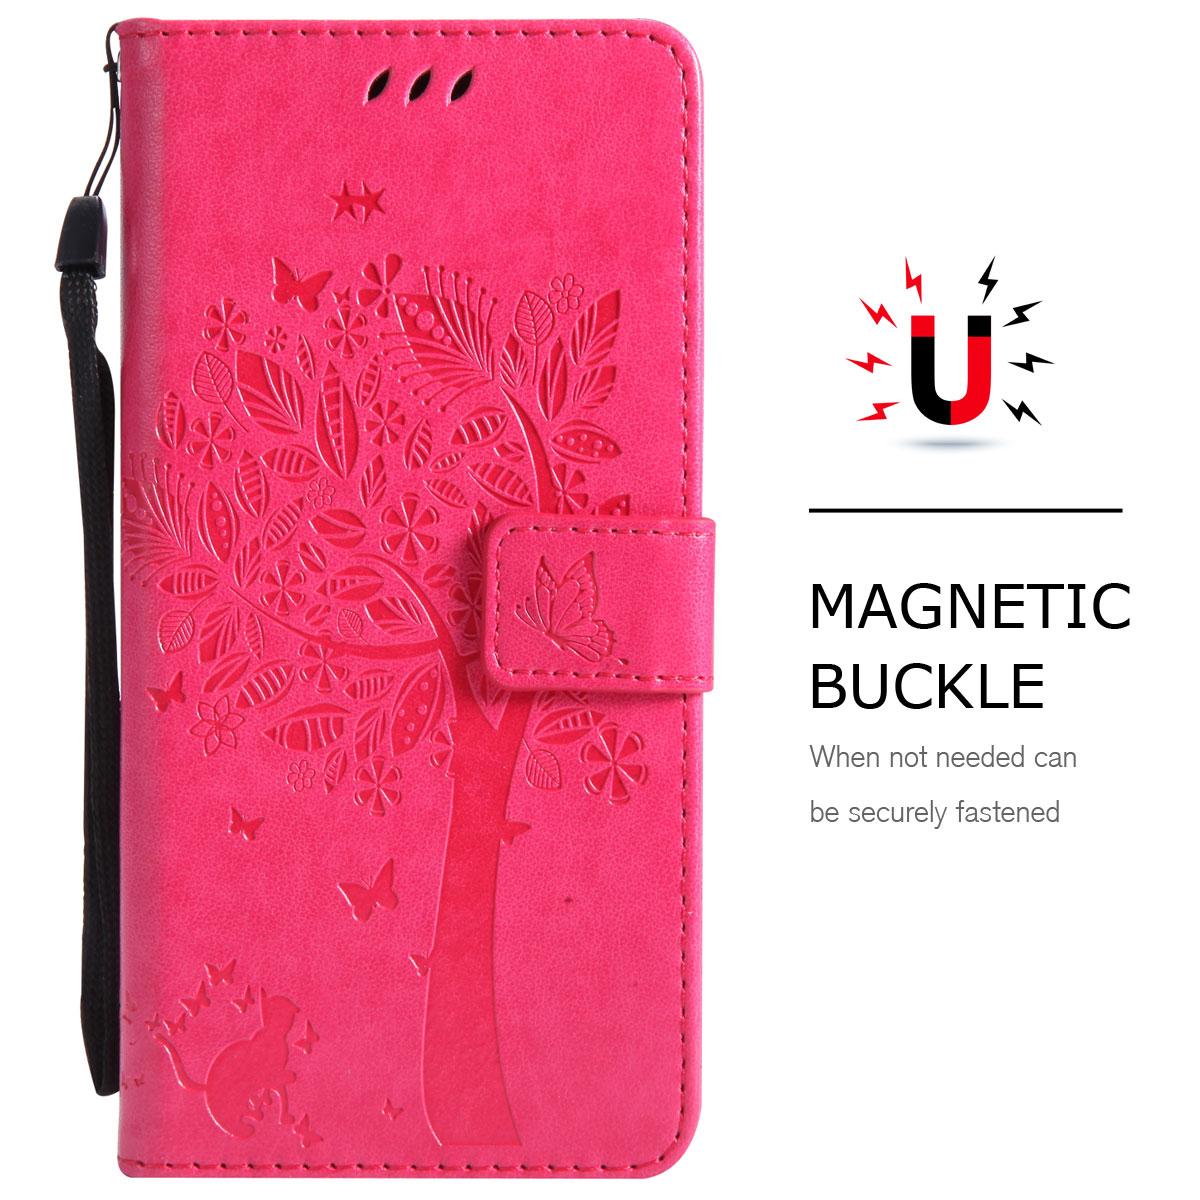 Magnetic-Leather-Credit-Card-Holder-Flip-Case-Cover-For-Google-Pixel-2-2-XL thumbnail 44